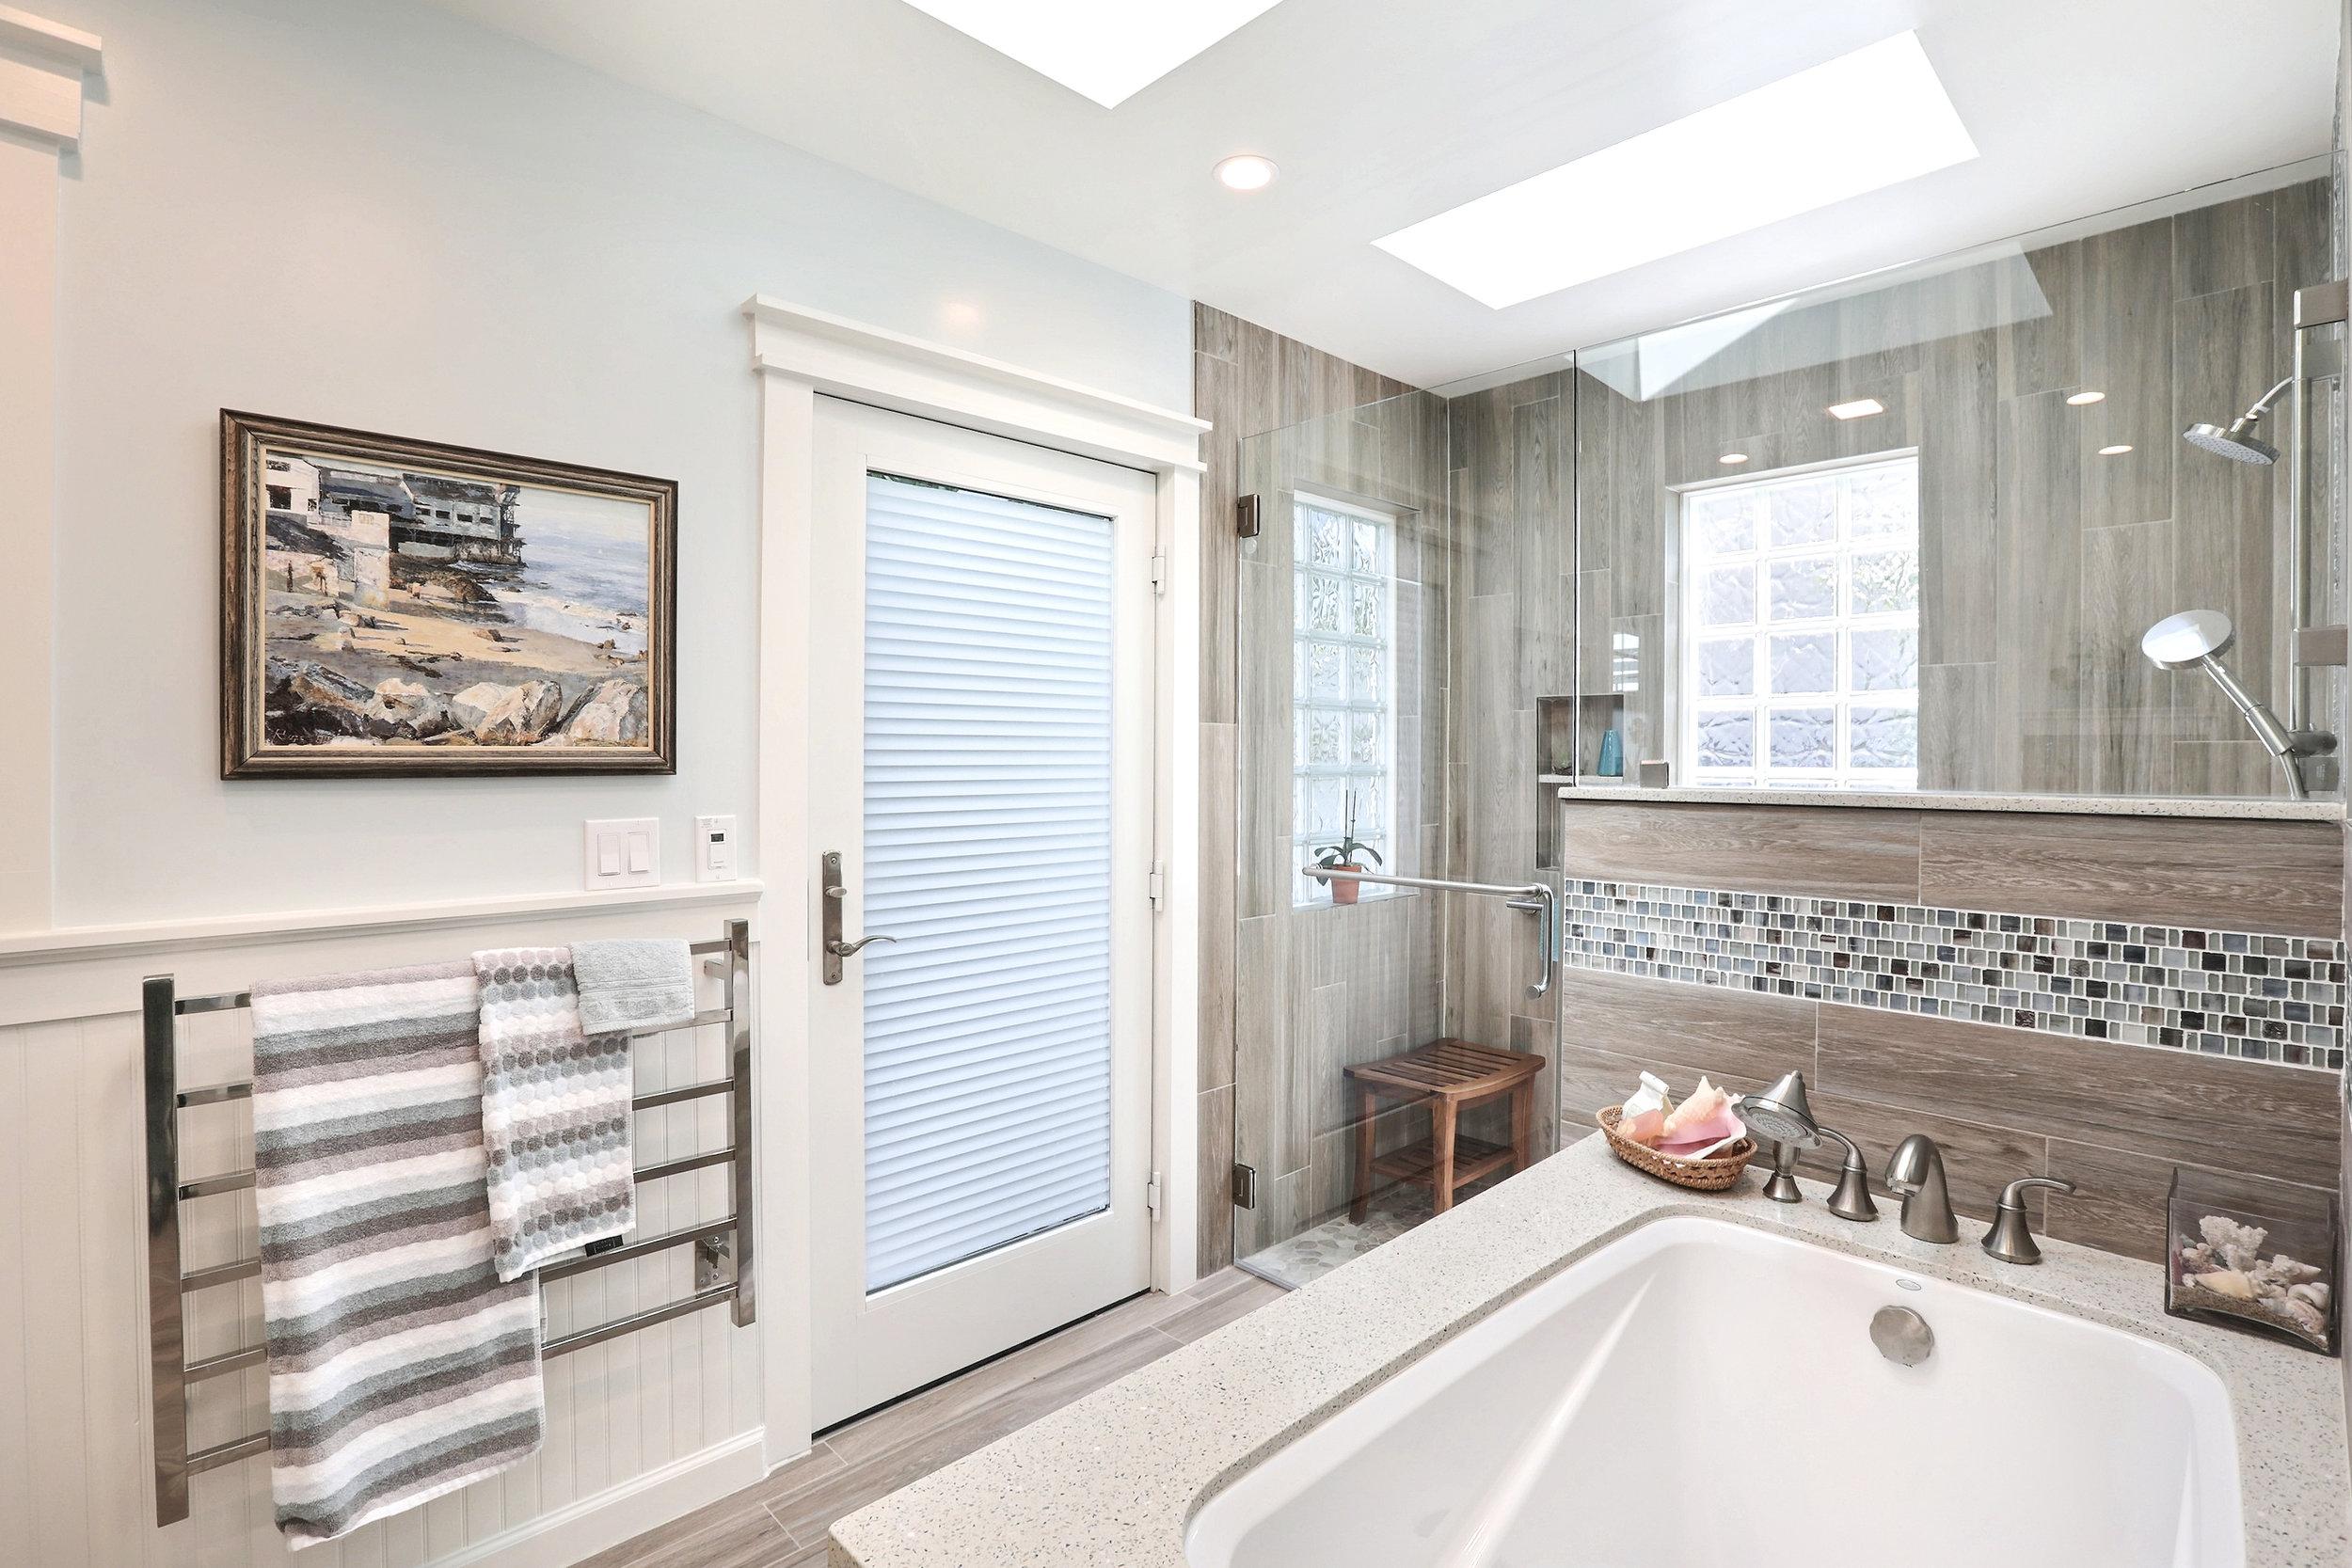 Tub/Shower Area After